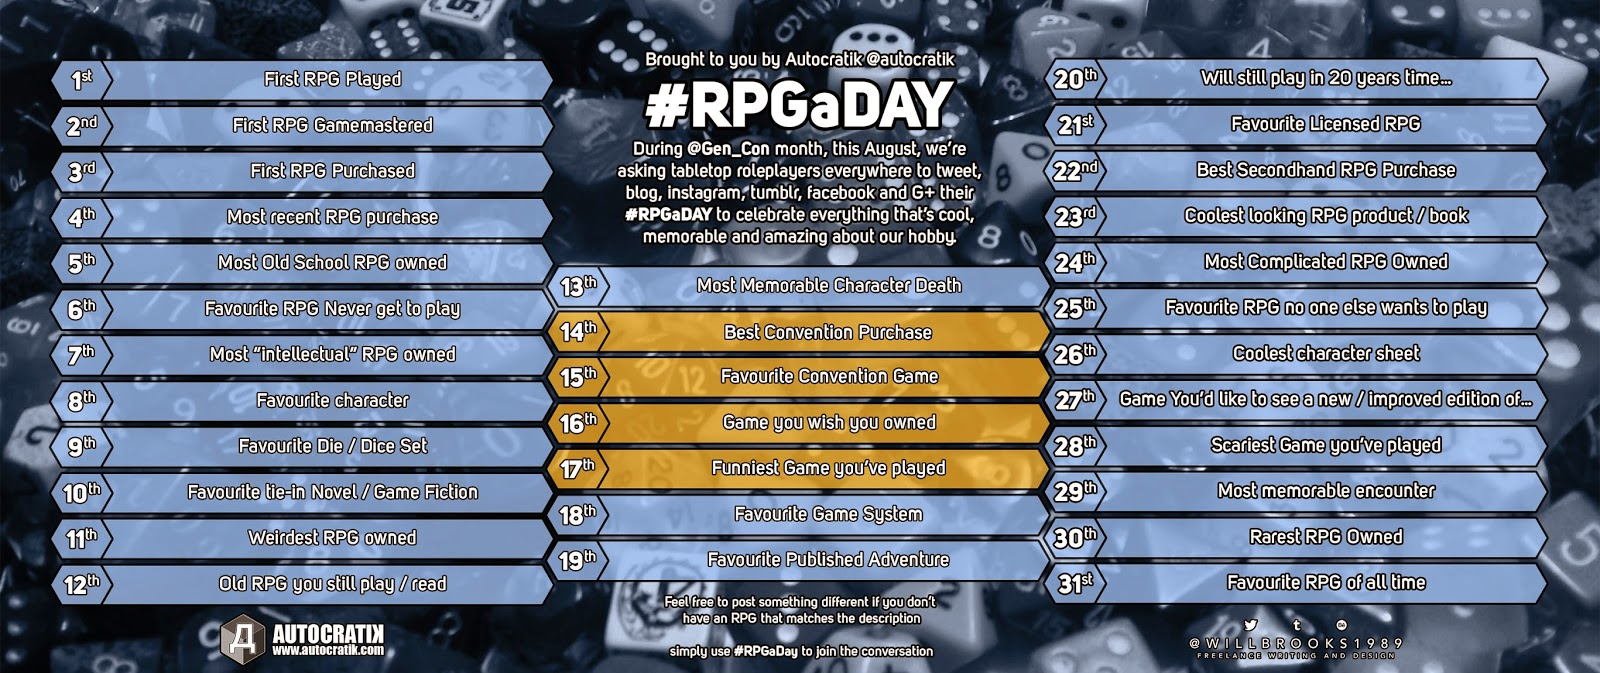 #RPGaDay (Image: autocratic.com/@autocratik)